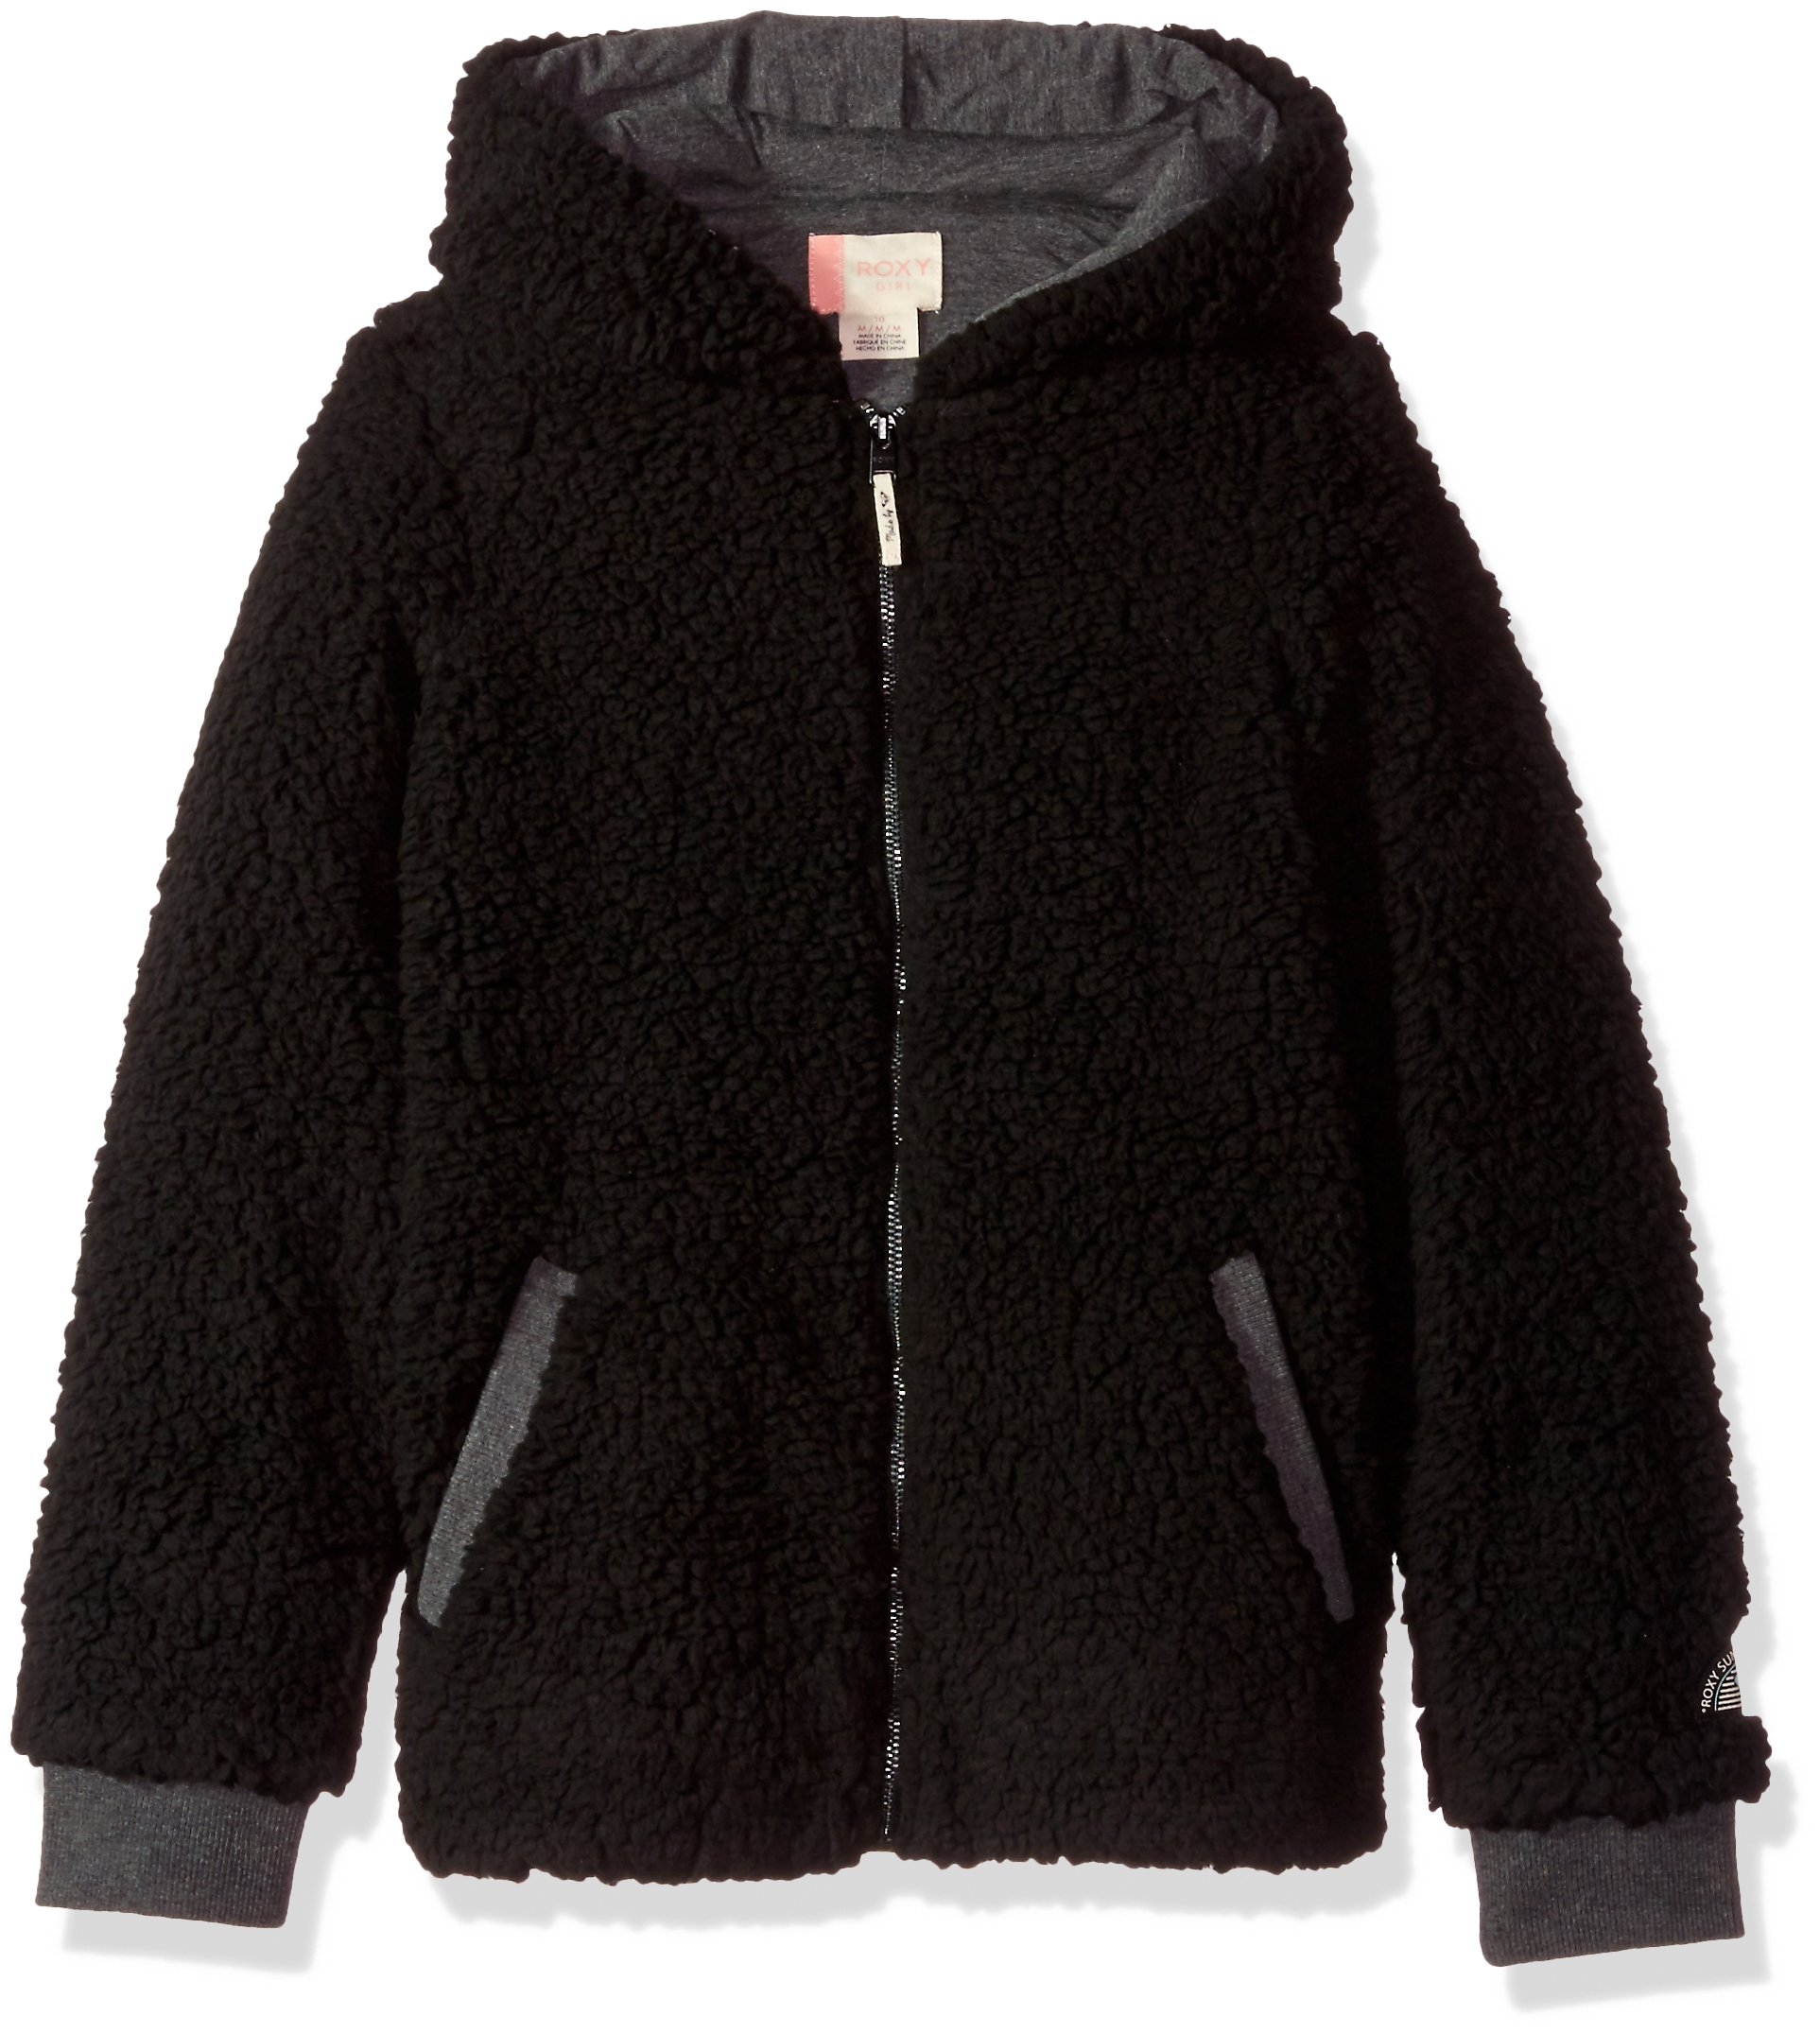 Roxy Big Girls' Fashion Sherpa Sweatshirt, Charcoal Heather, 12/L by Roxy